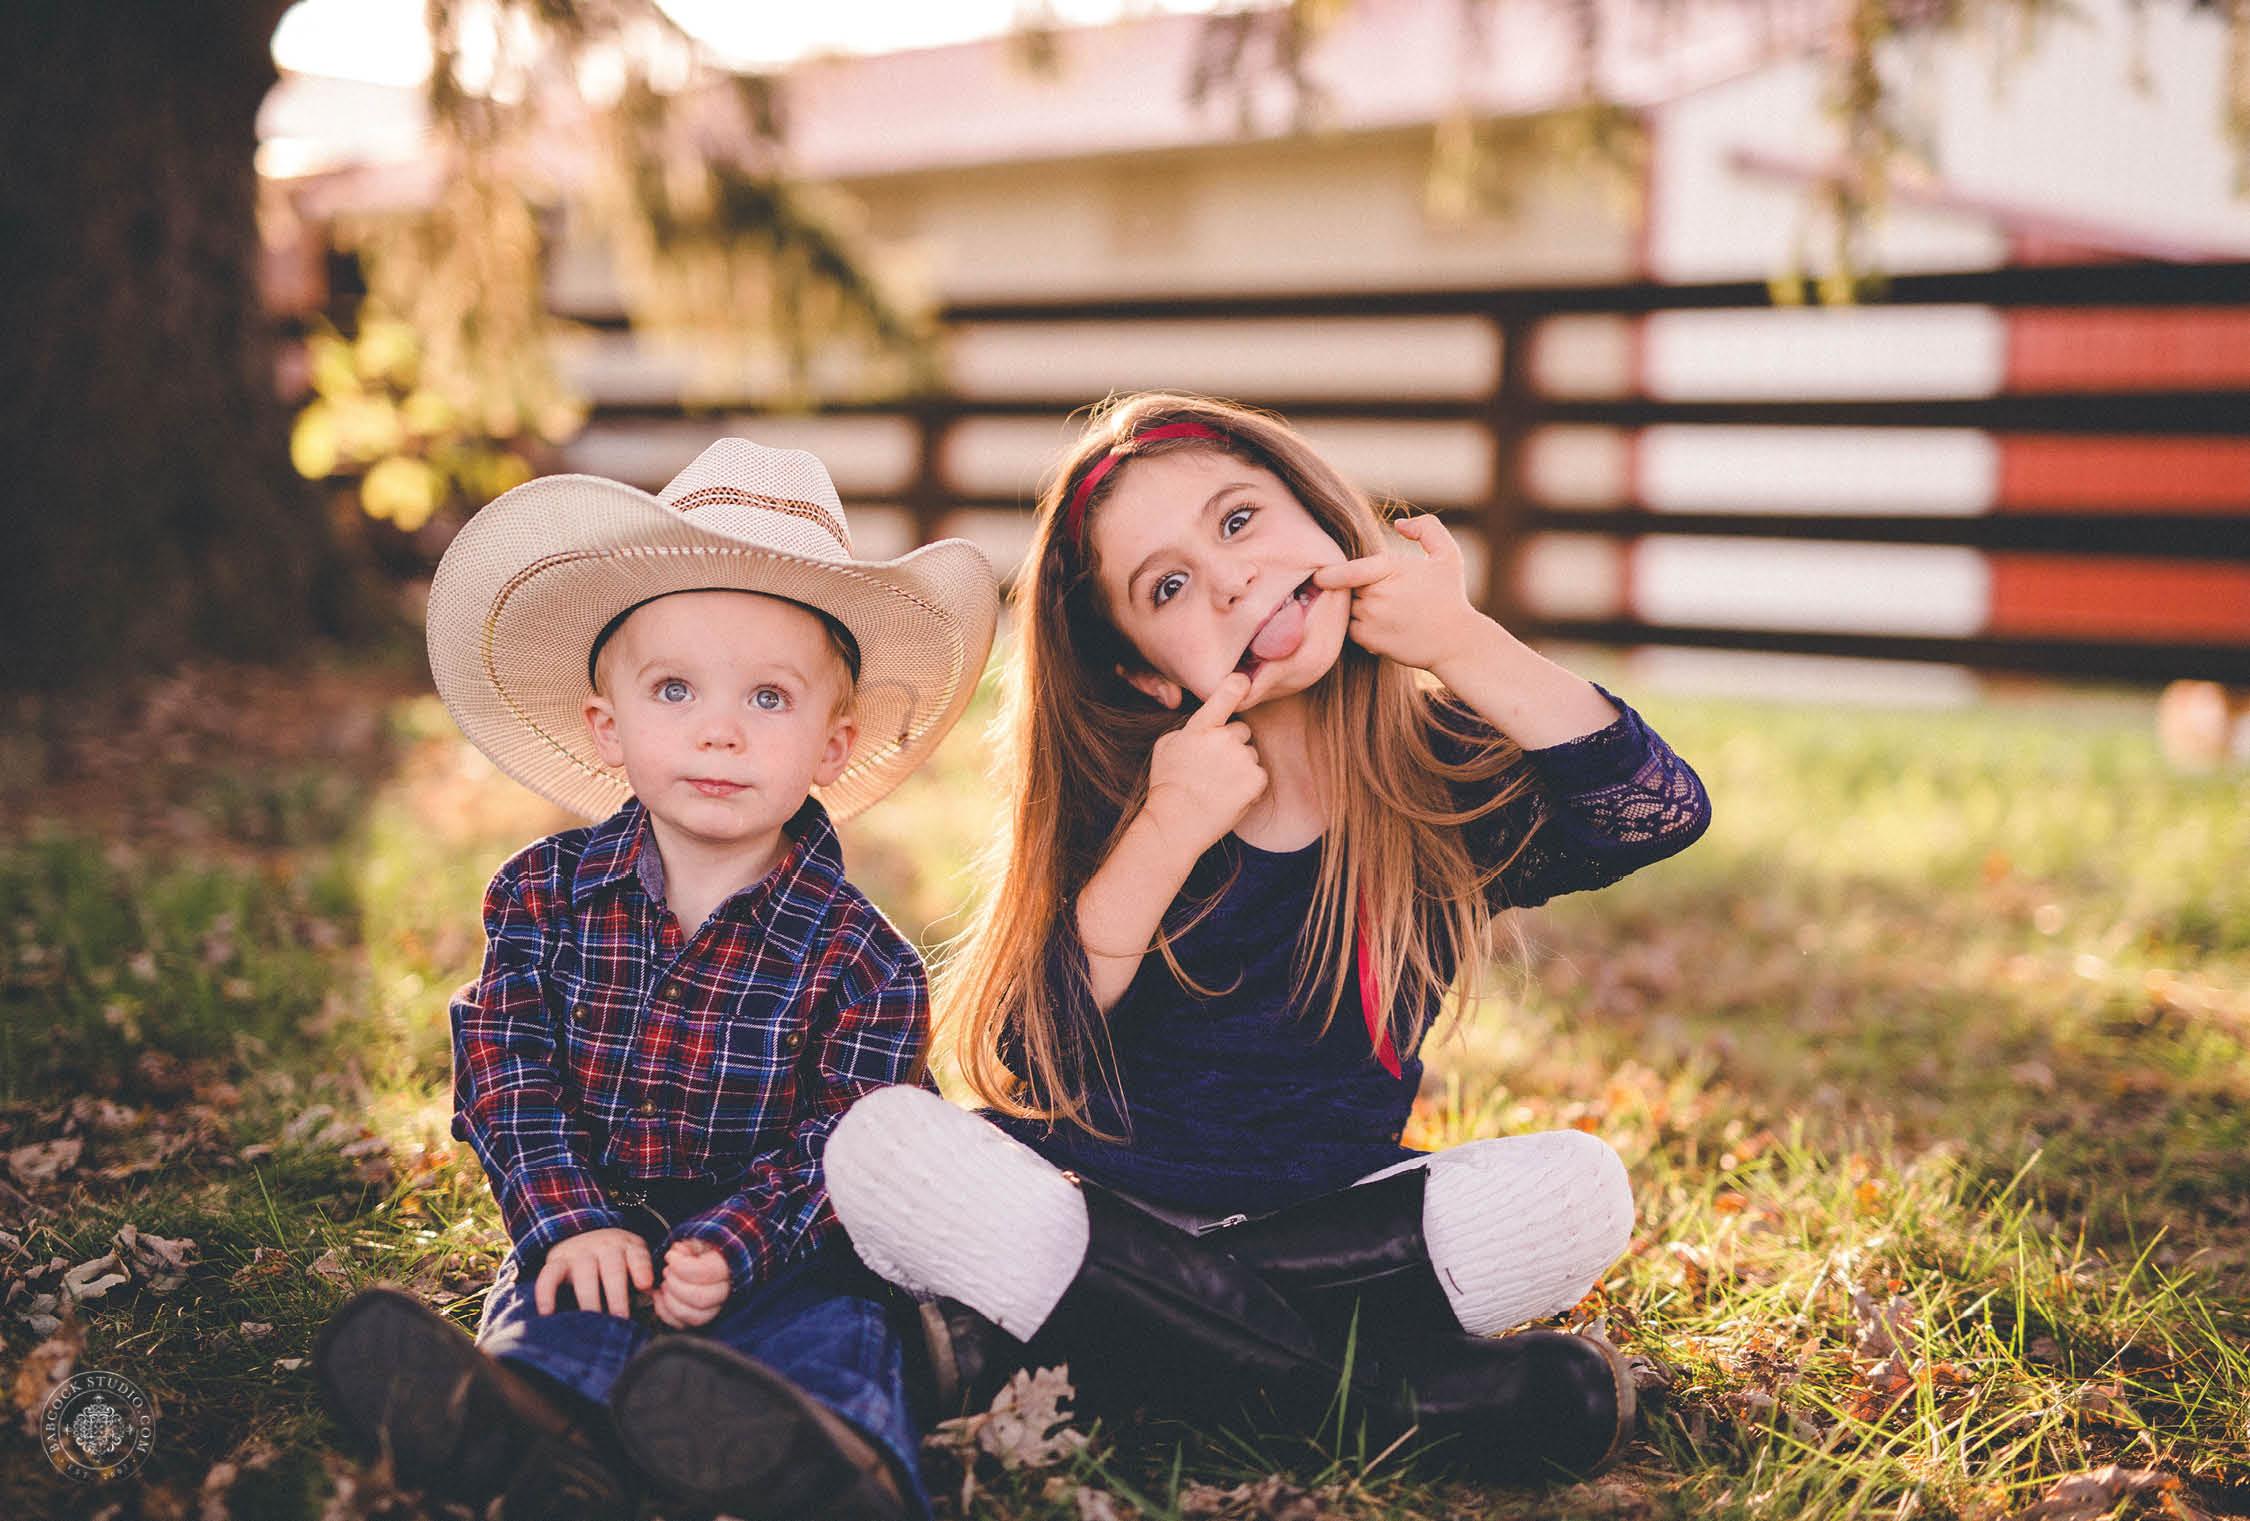 vance-family-children-photographer-dayton-ohio-7.jpg